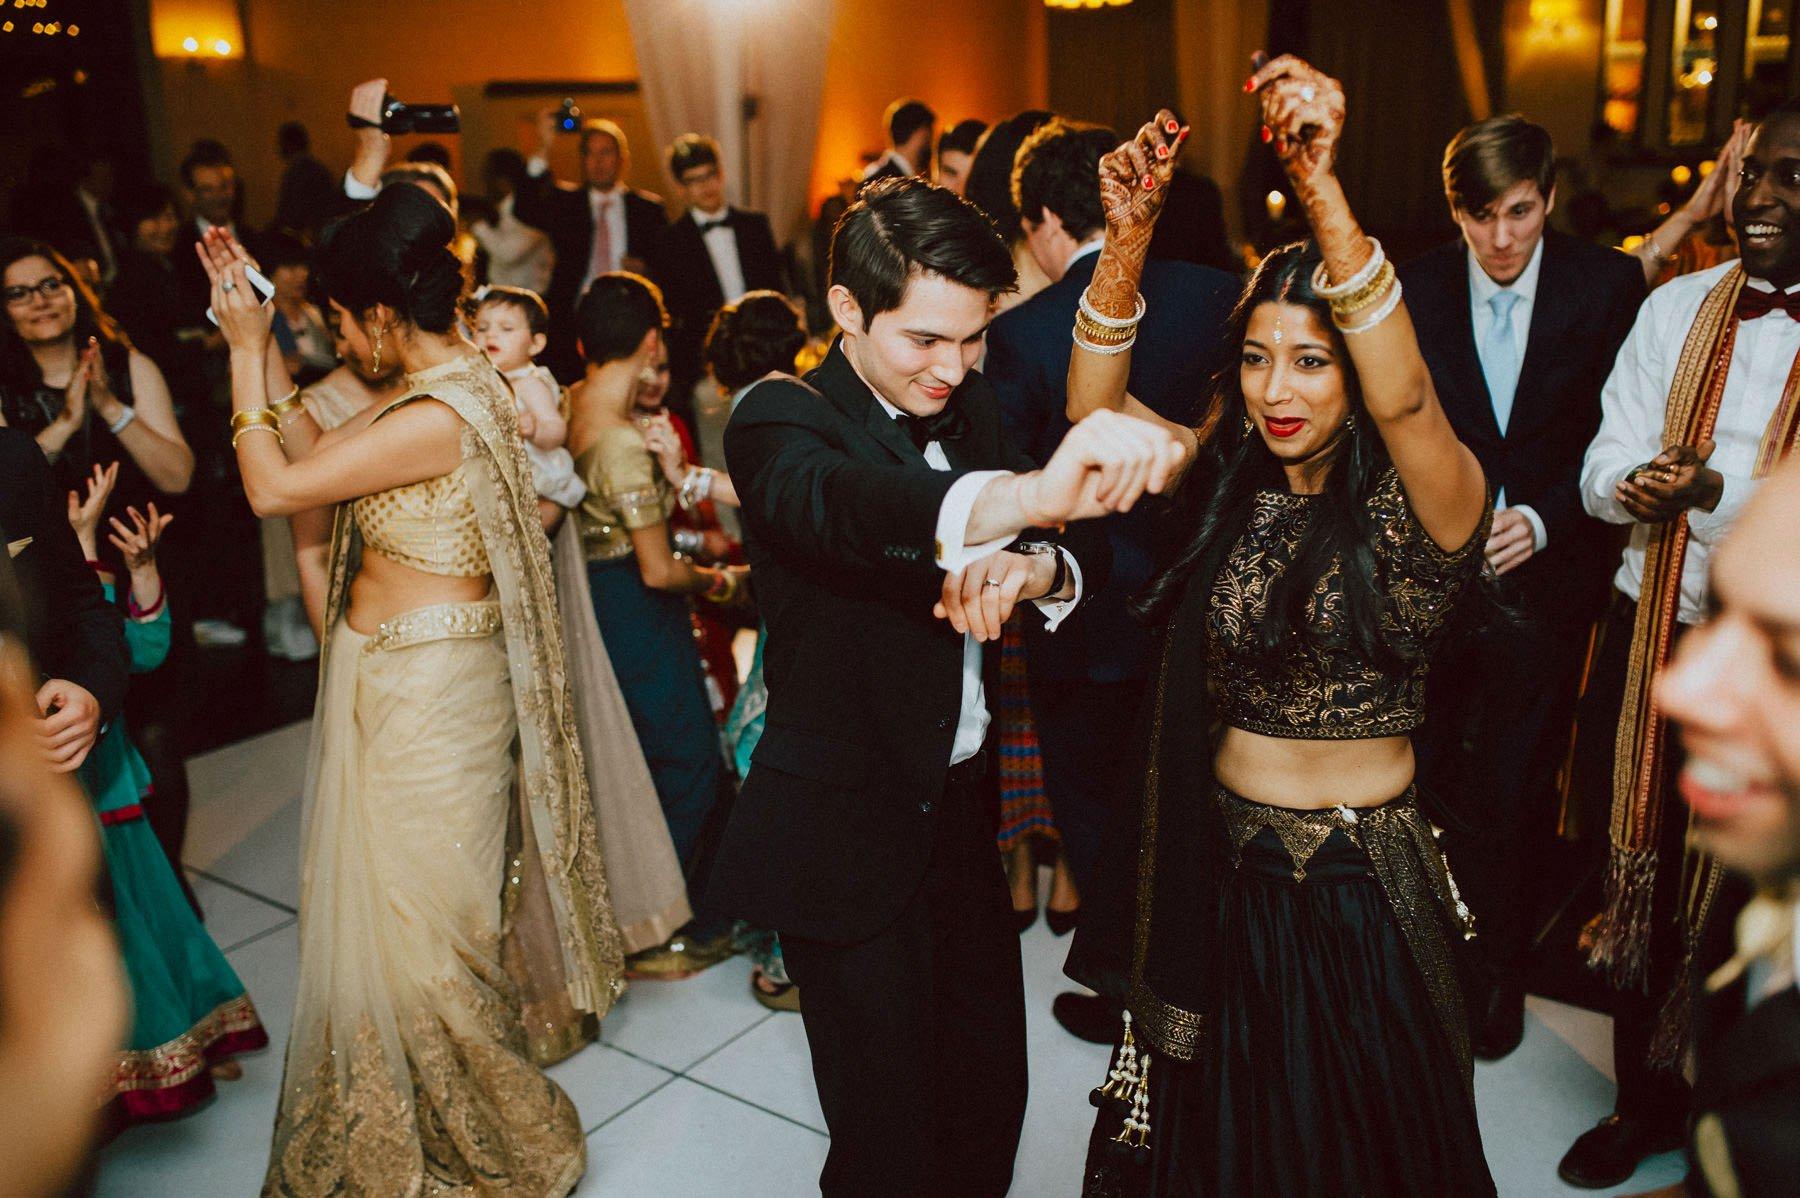 vie-philadelphia-indian-wedding-121.jpg